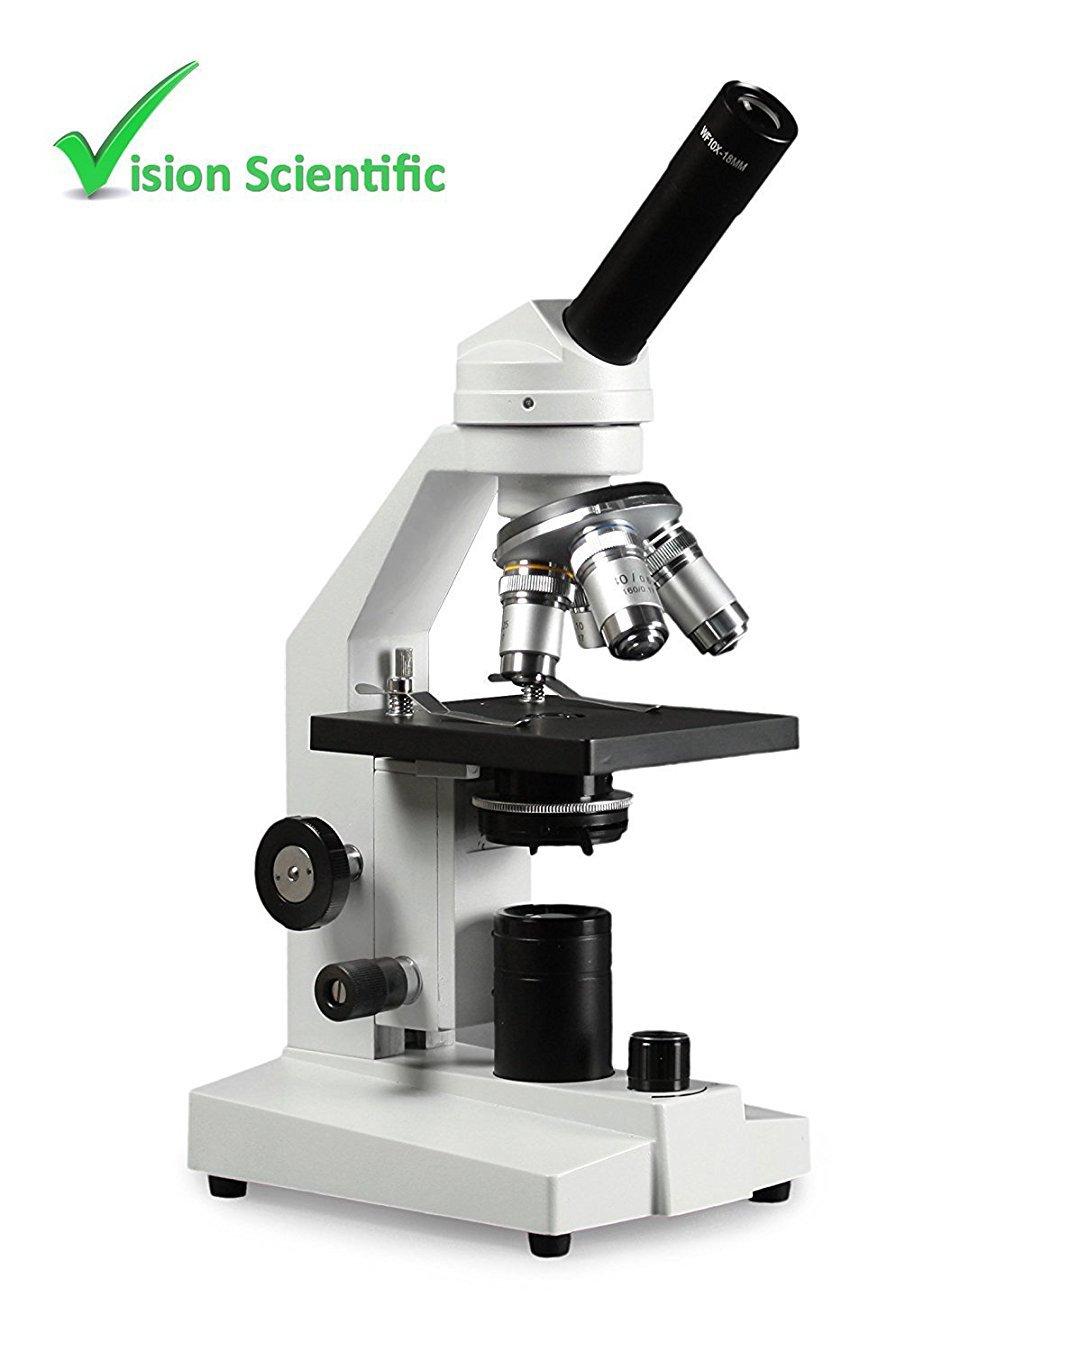 Vision Scientific VME0020X-E2 LED Microscope, 40x-2000x Magnification, LED Illumination with Intensity Control, 1.25 N.A Abbe Condenser, Coarse and Fine Focus, 110V